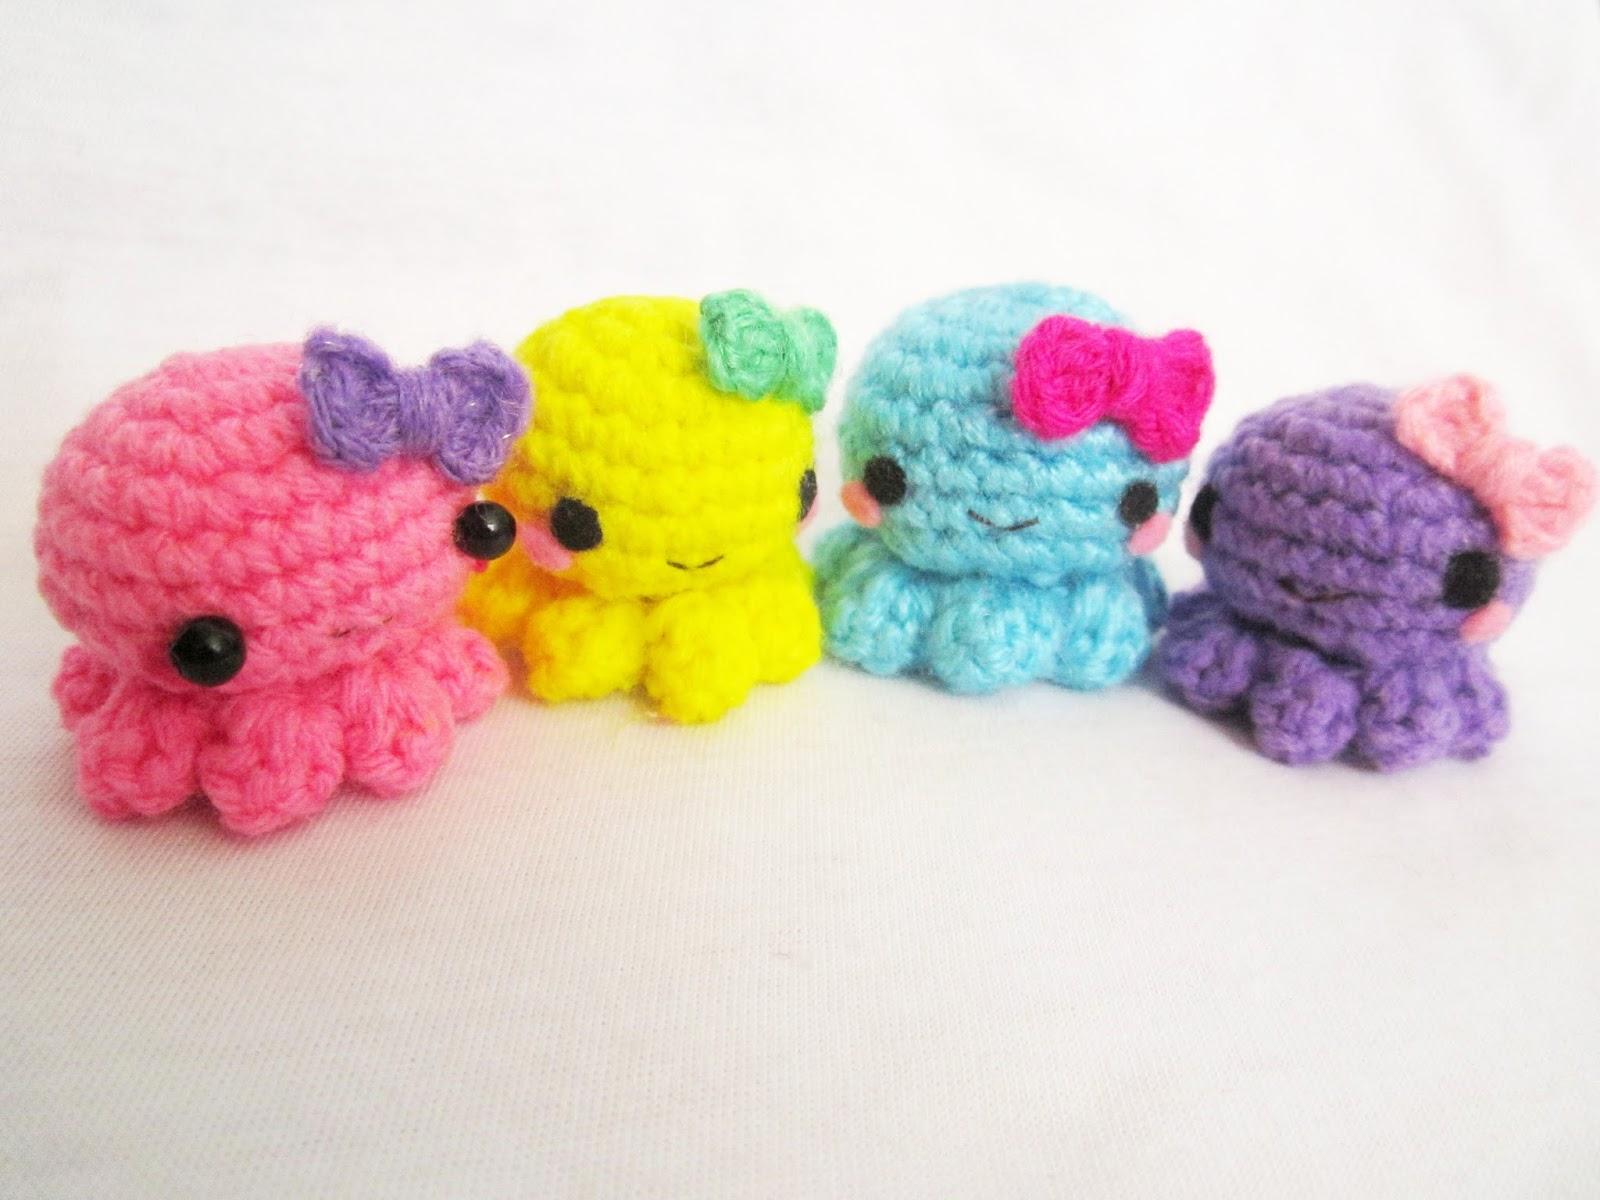 Amigurumi Many : A little love everyday!: Baby octopus amigurumi